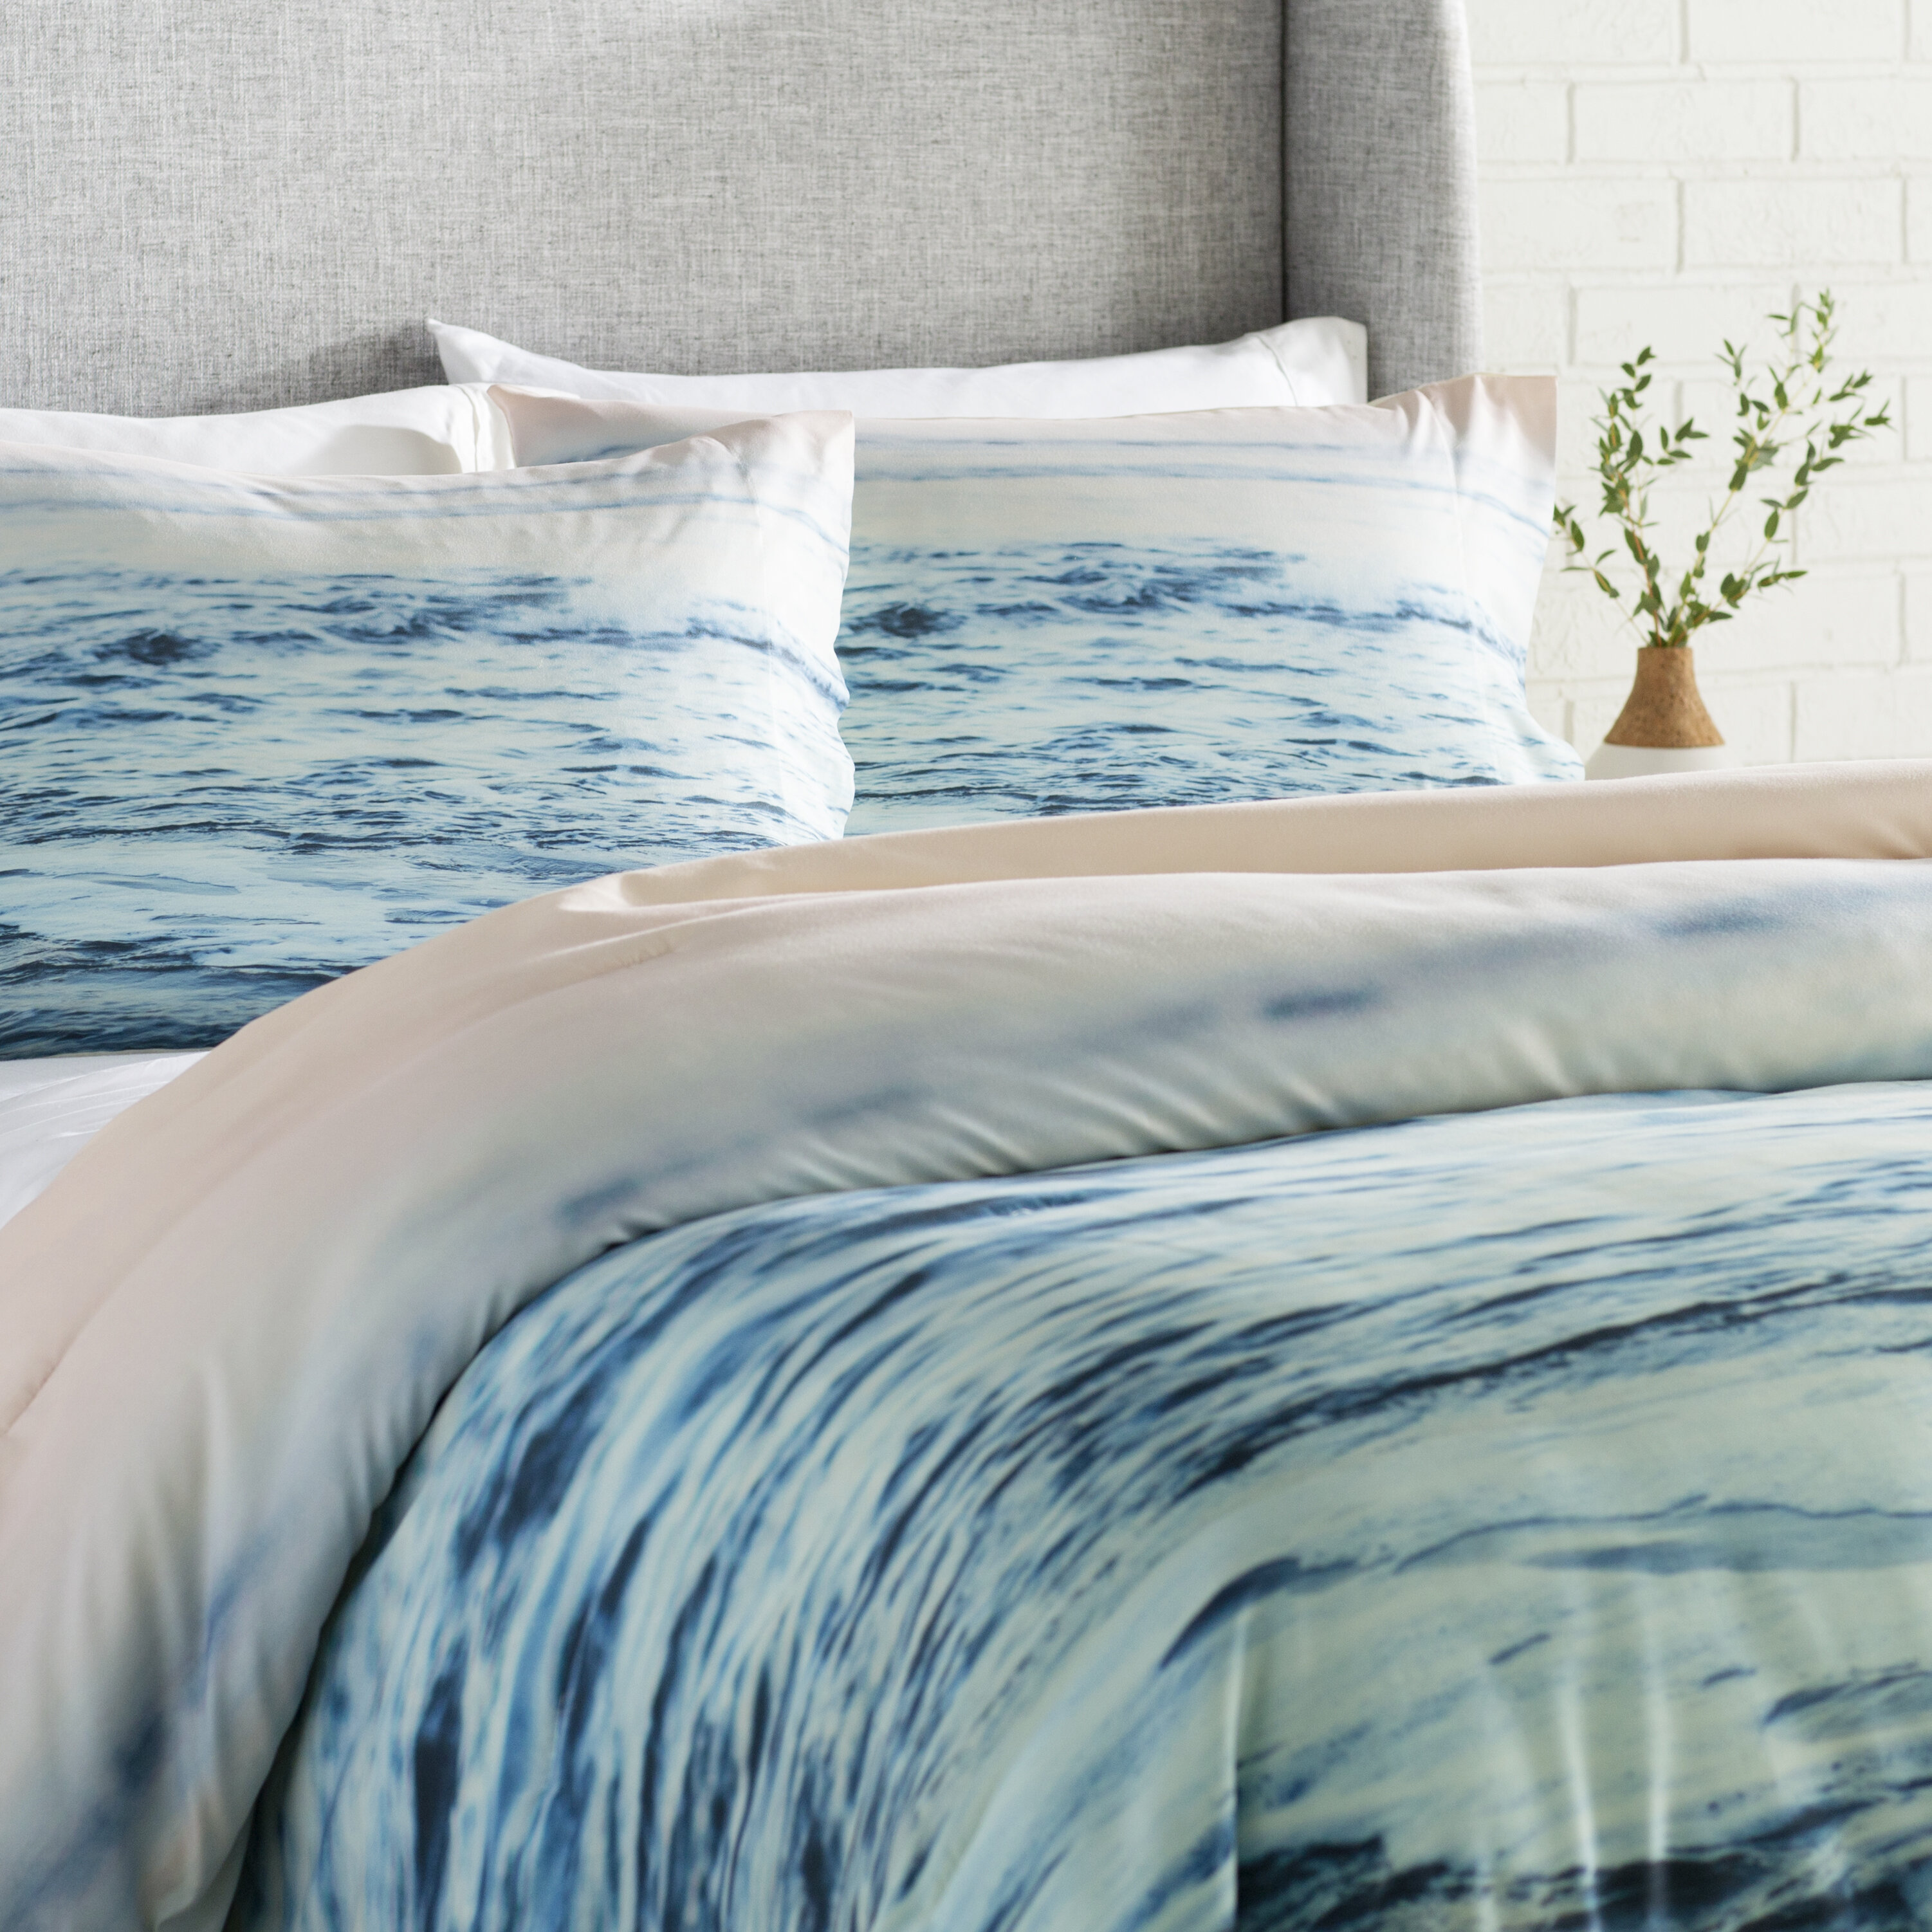 East Urban Home Pacific Ocean Waves Comforter Set & Reviews | Wayfair